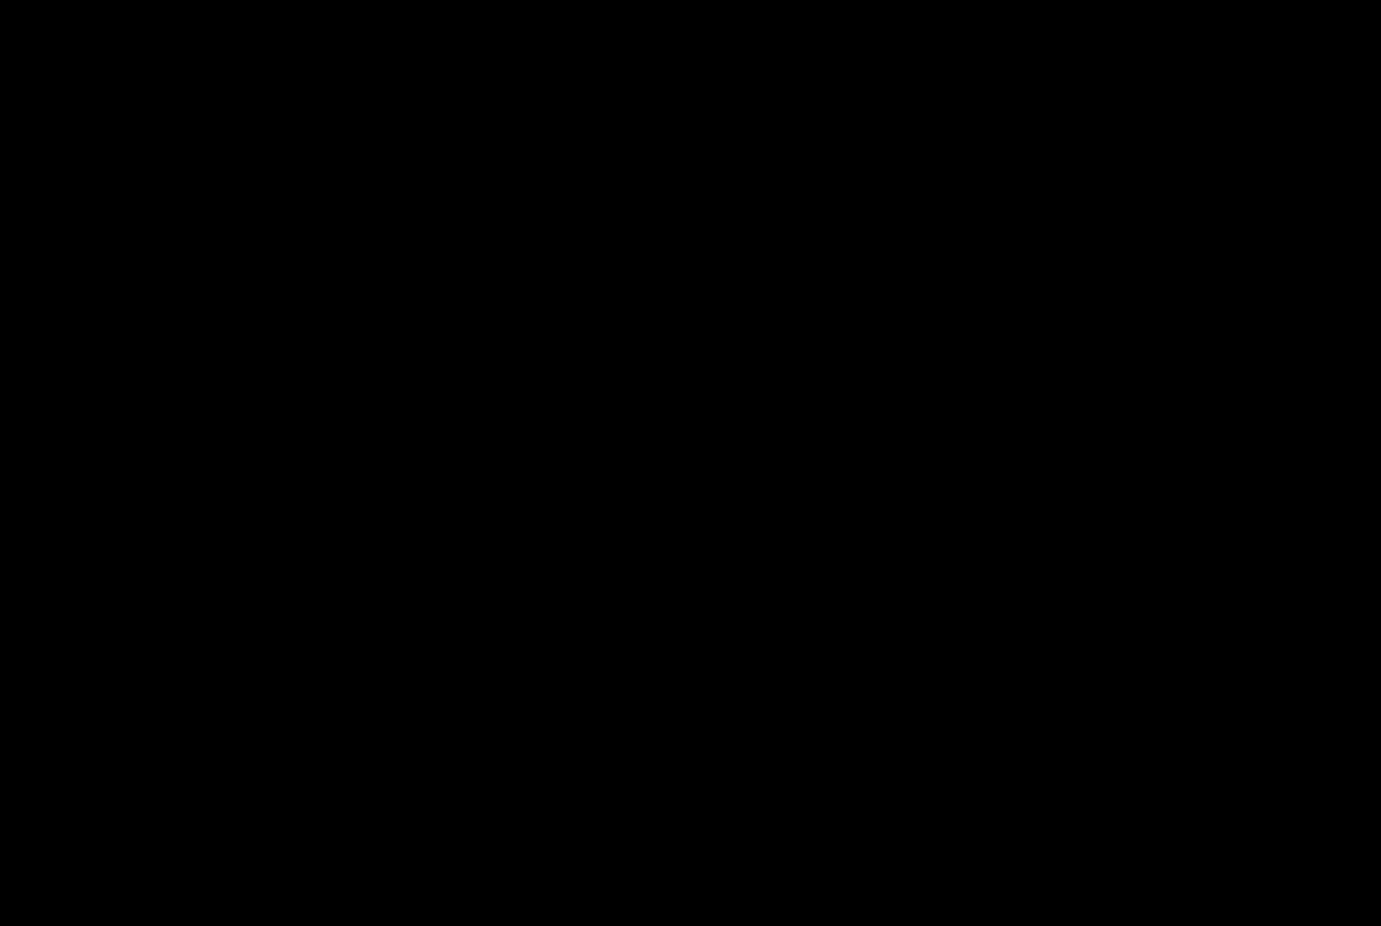 musical staff sign